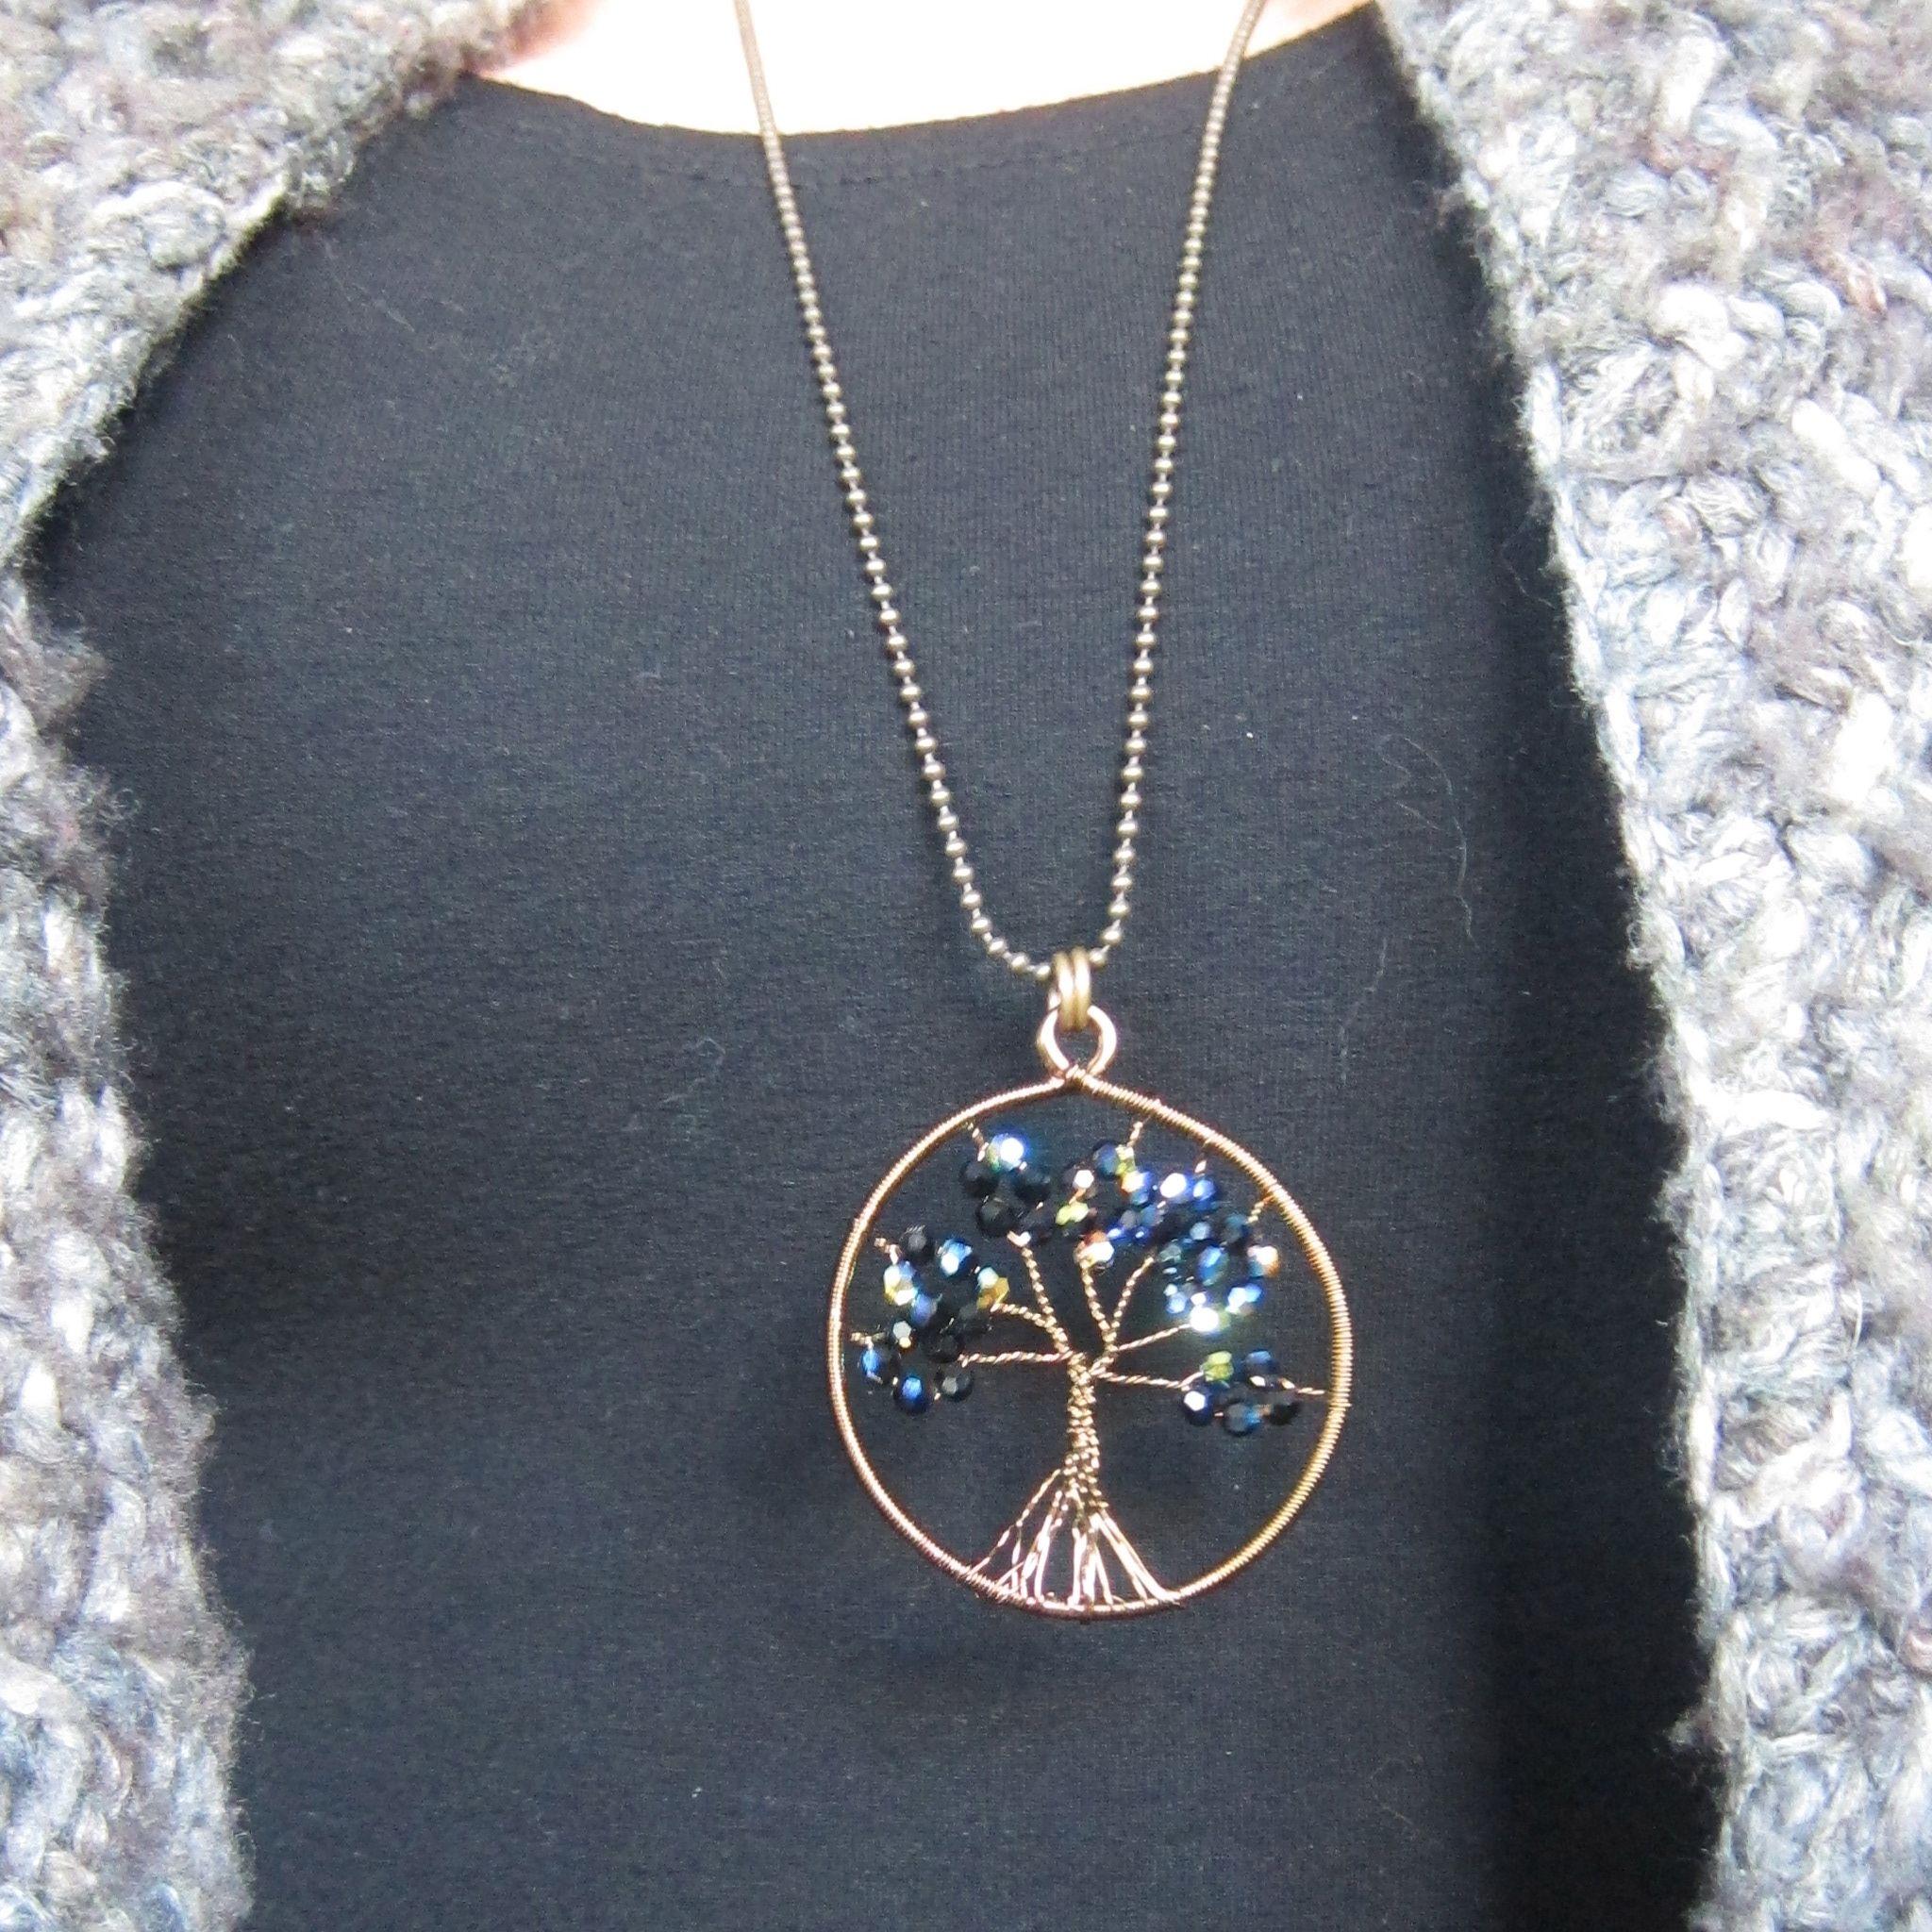 Intu Tree Of Life Handcrafted With Swarovski Elementsintujewelry